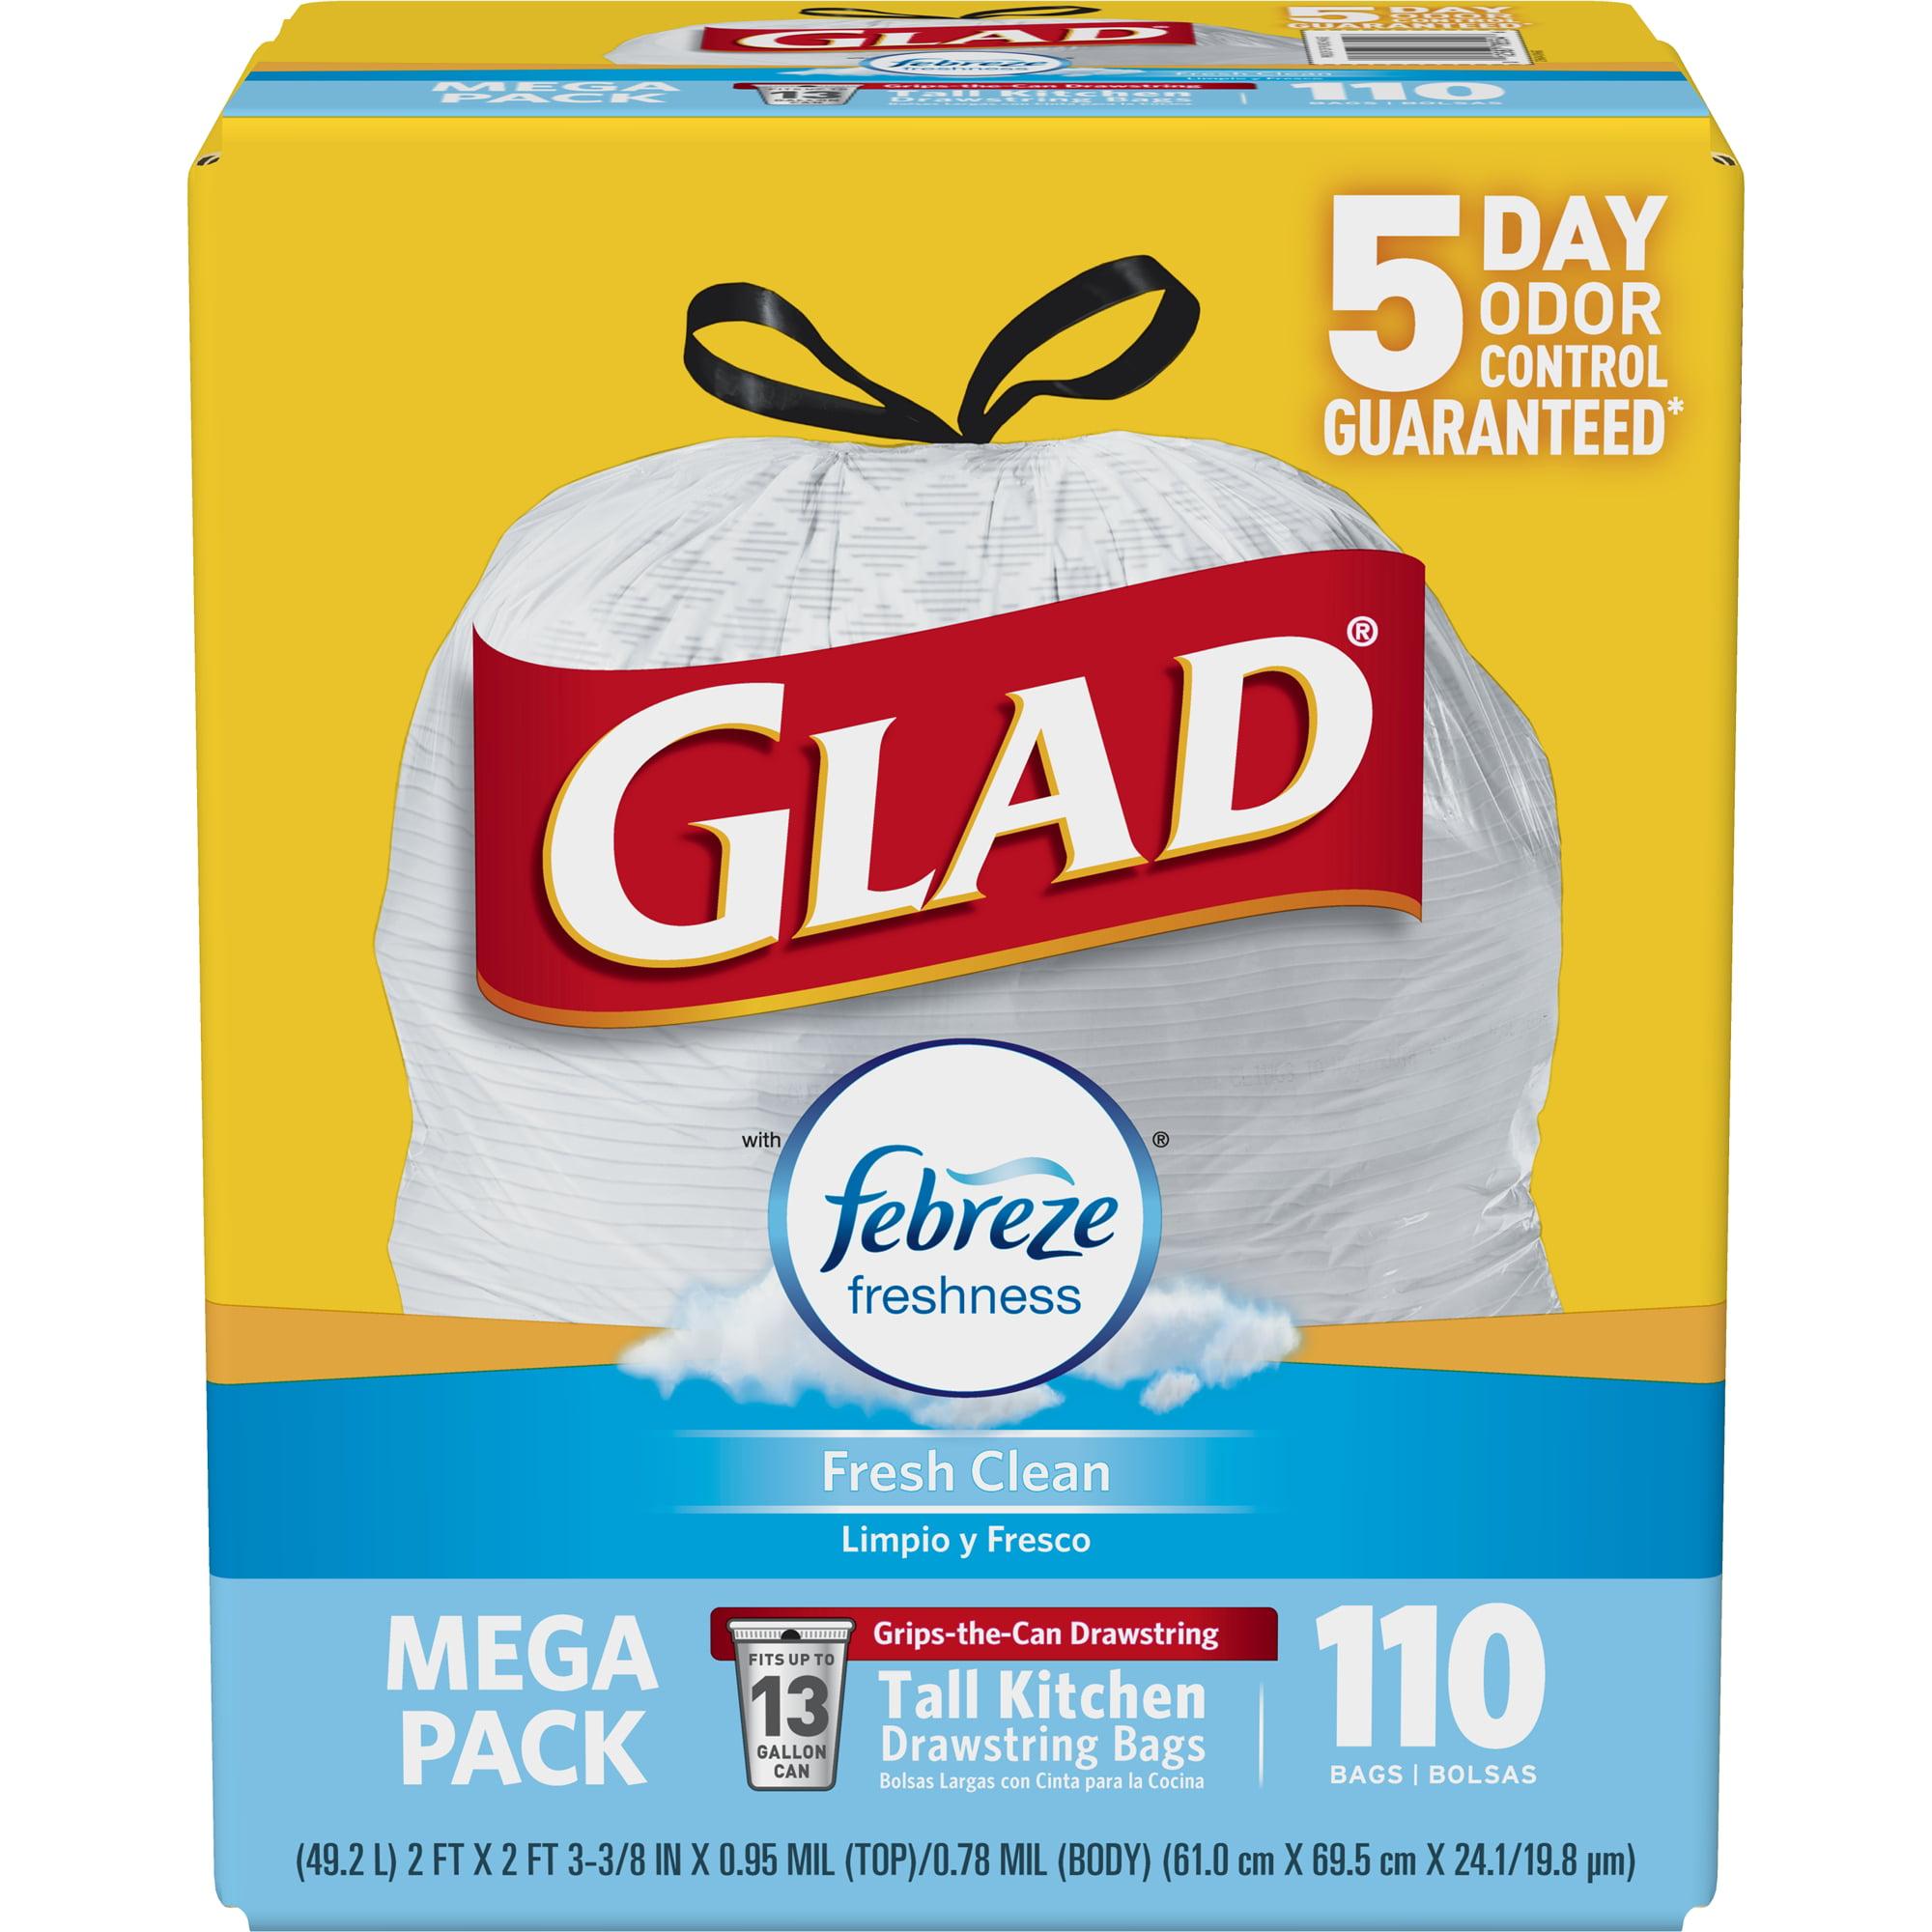 Glad OdorShield Tall Kitchen Drawstring Trash Bags, Febreze Fresh Clean, 13 Gallon, 110 Count